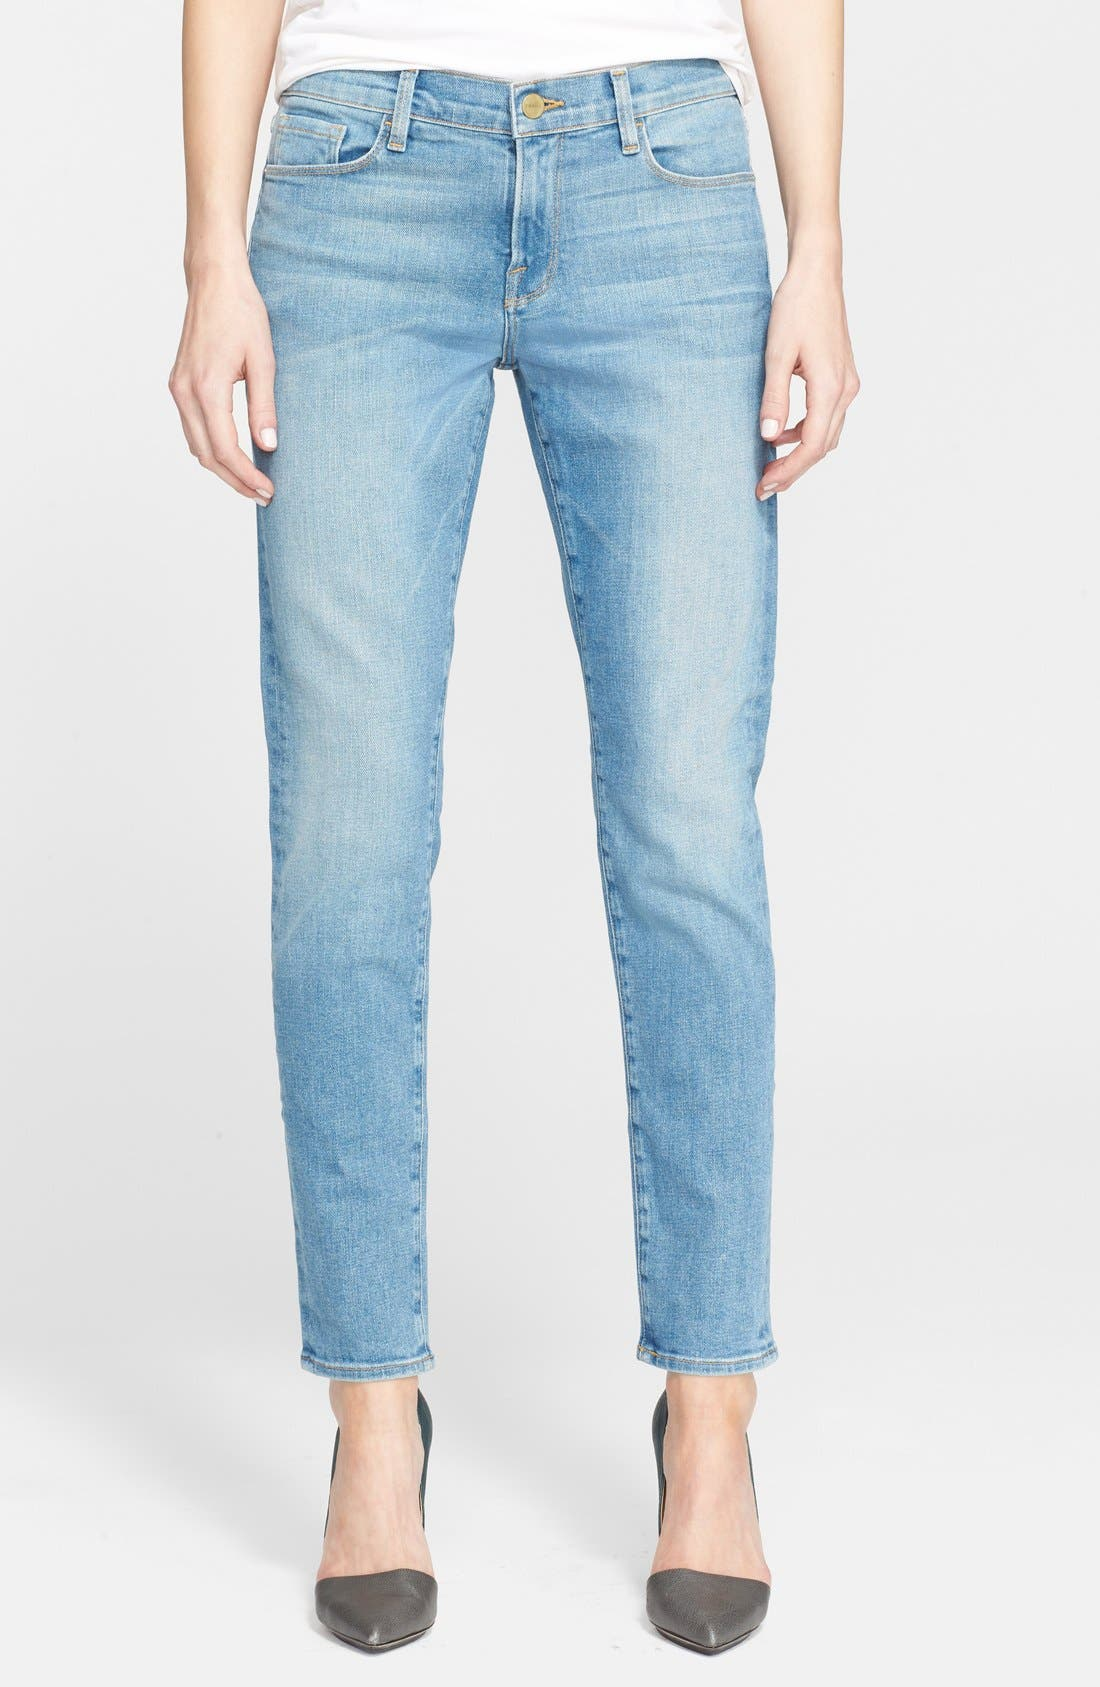 Main Image - Frame Denim 'Le Garcon' Boyfriend Jeans (Exmouth)